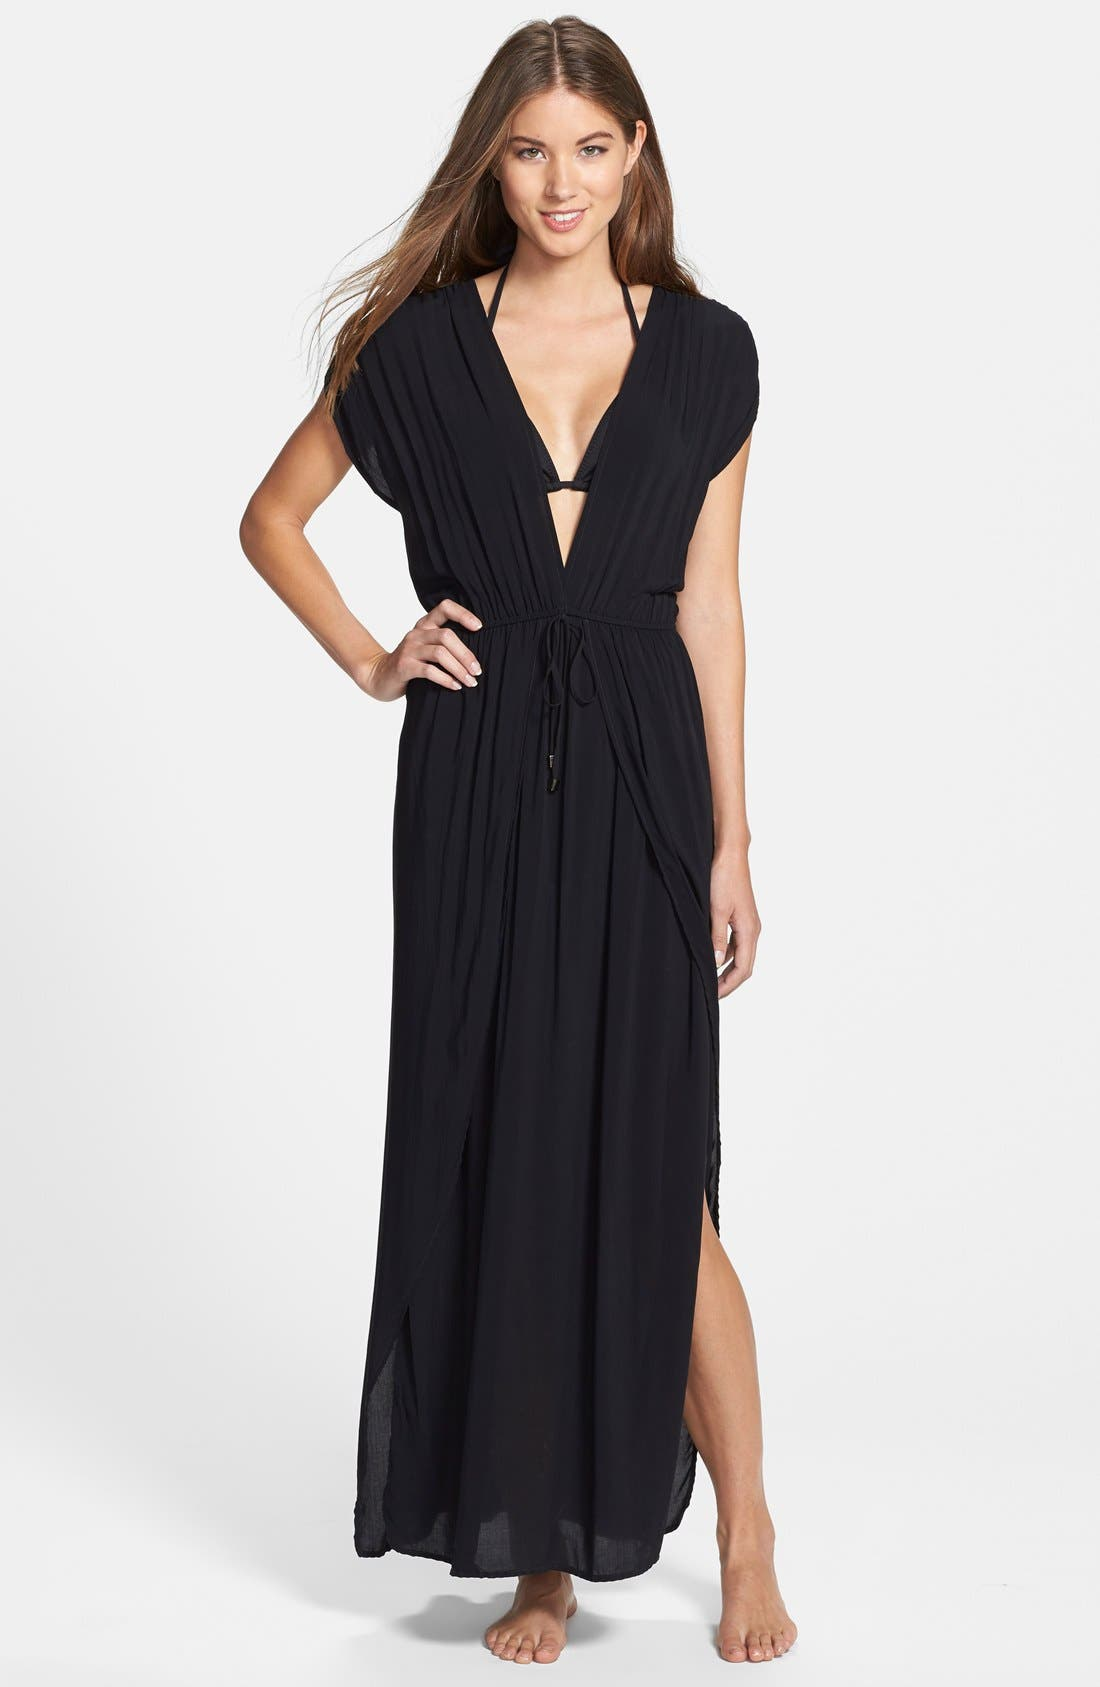 ELAN Deep V-Neck Cover-Up Maxi Dress in Black